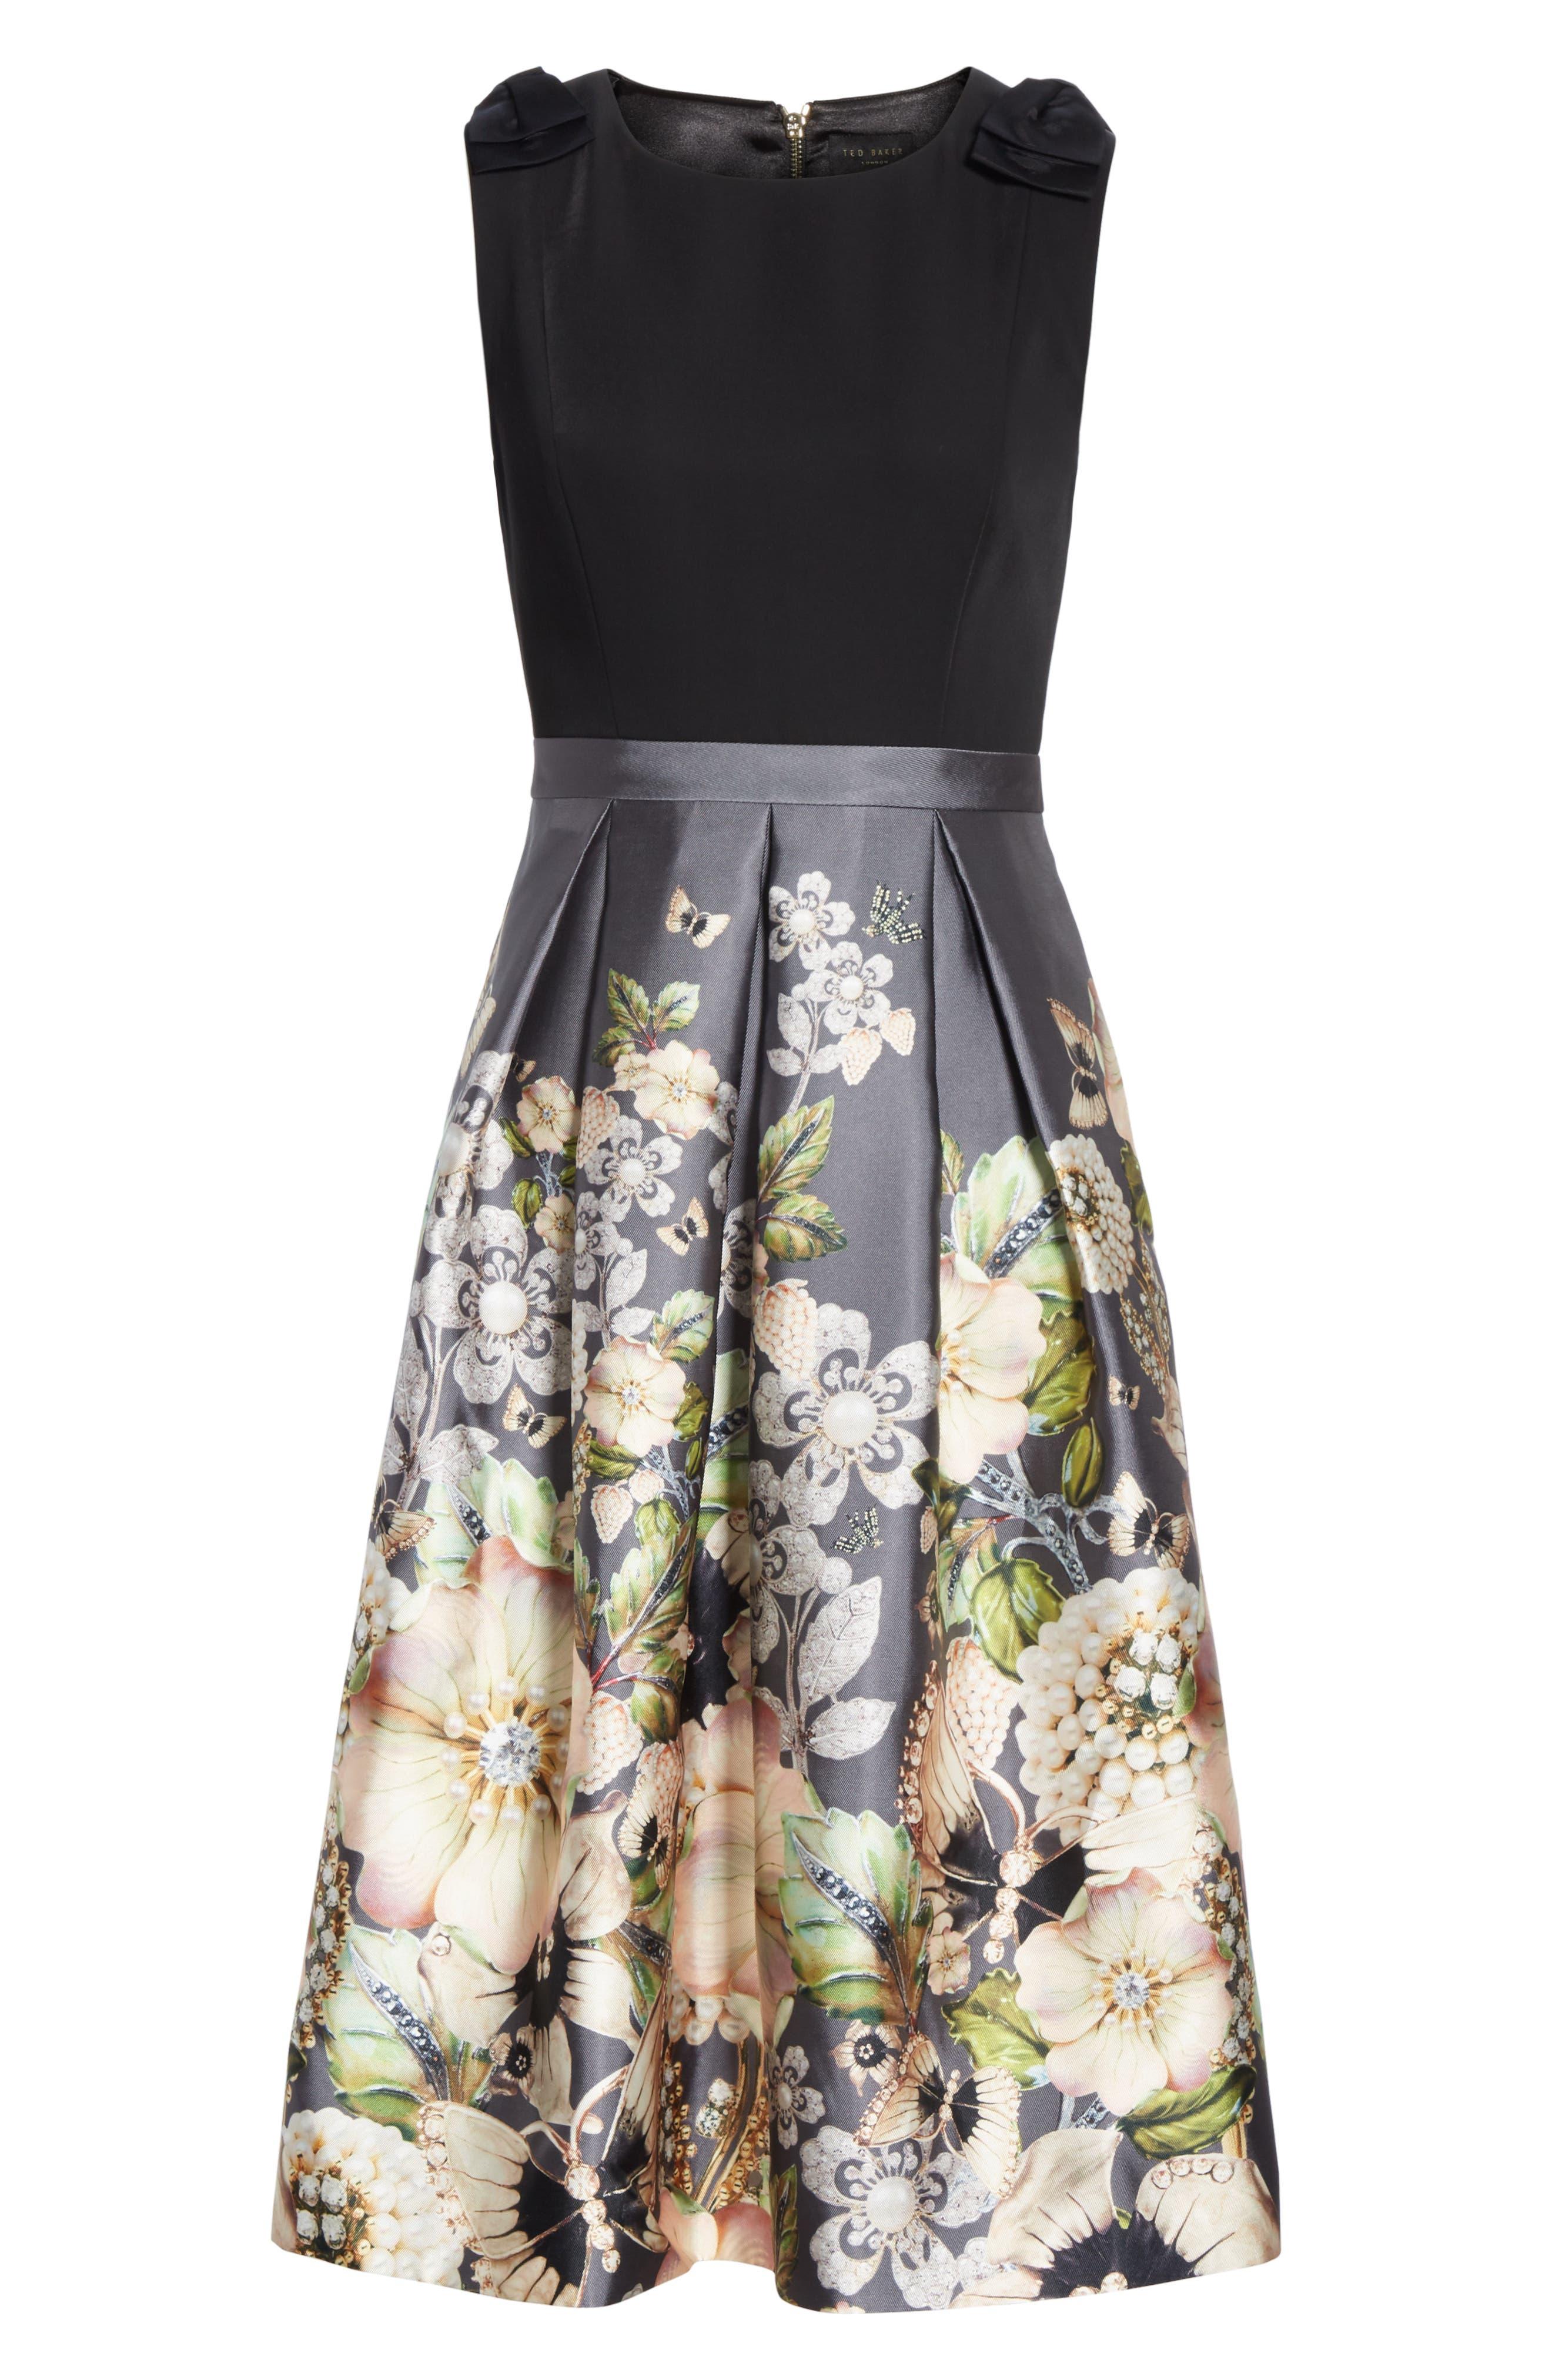 Molyka Gem Gardens Bow Dress,                             Alternate thumbnail 7, color,                             CHARCOAL